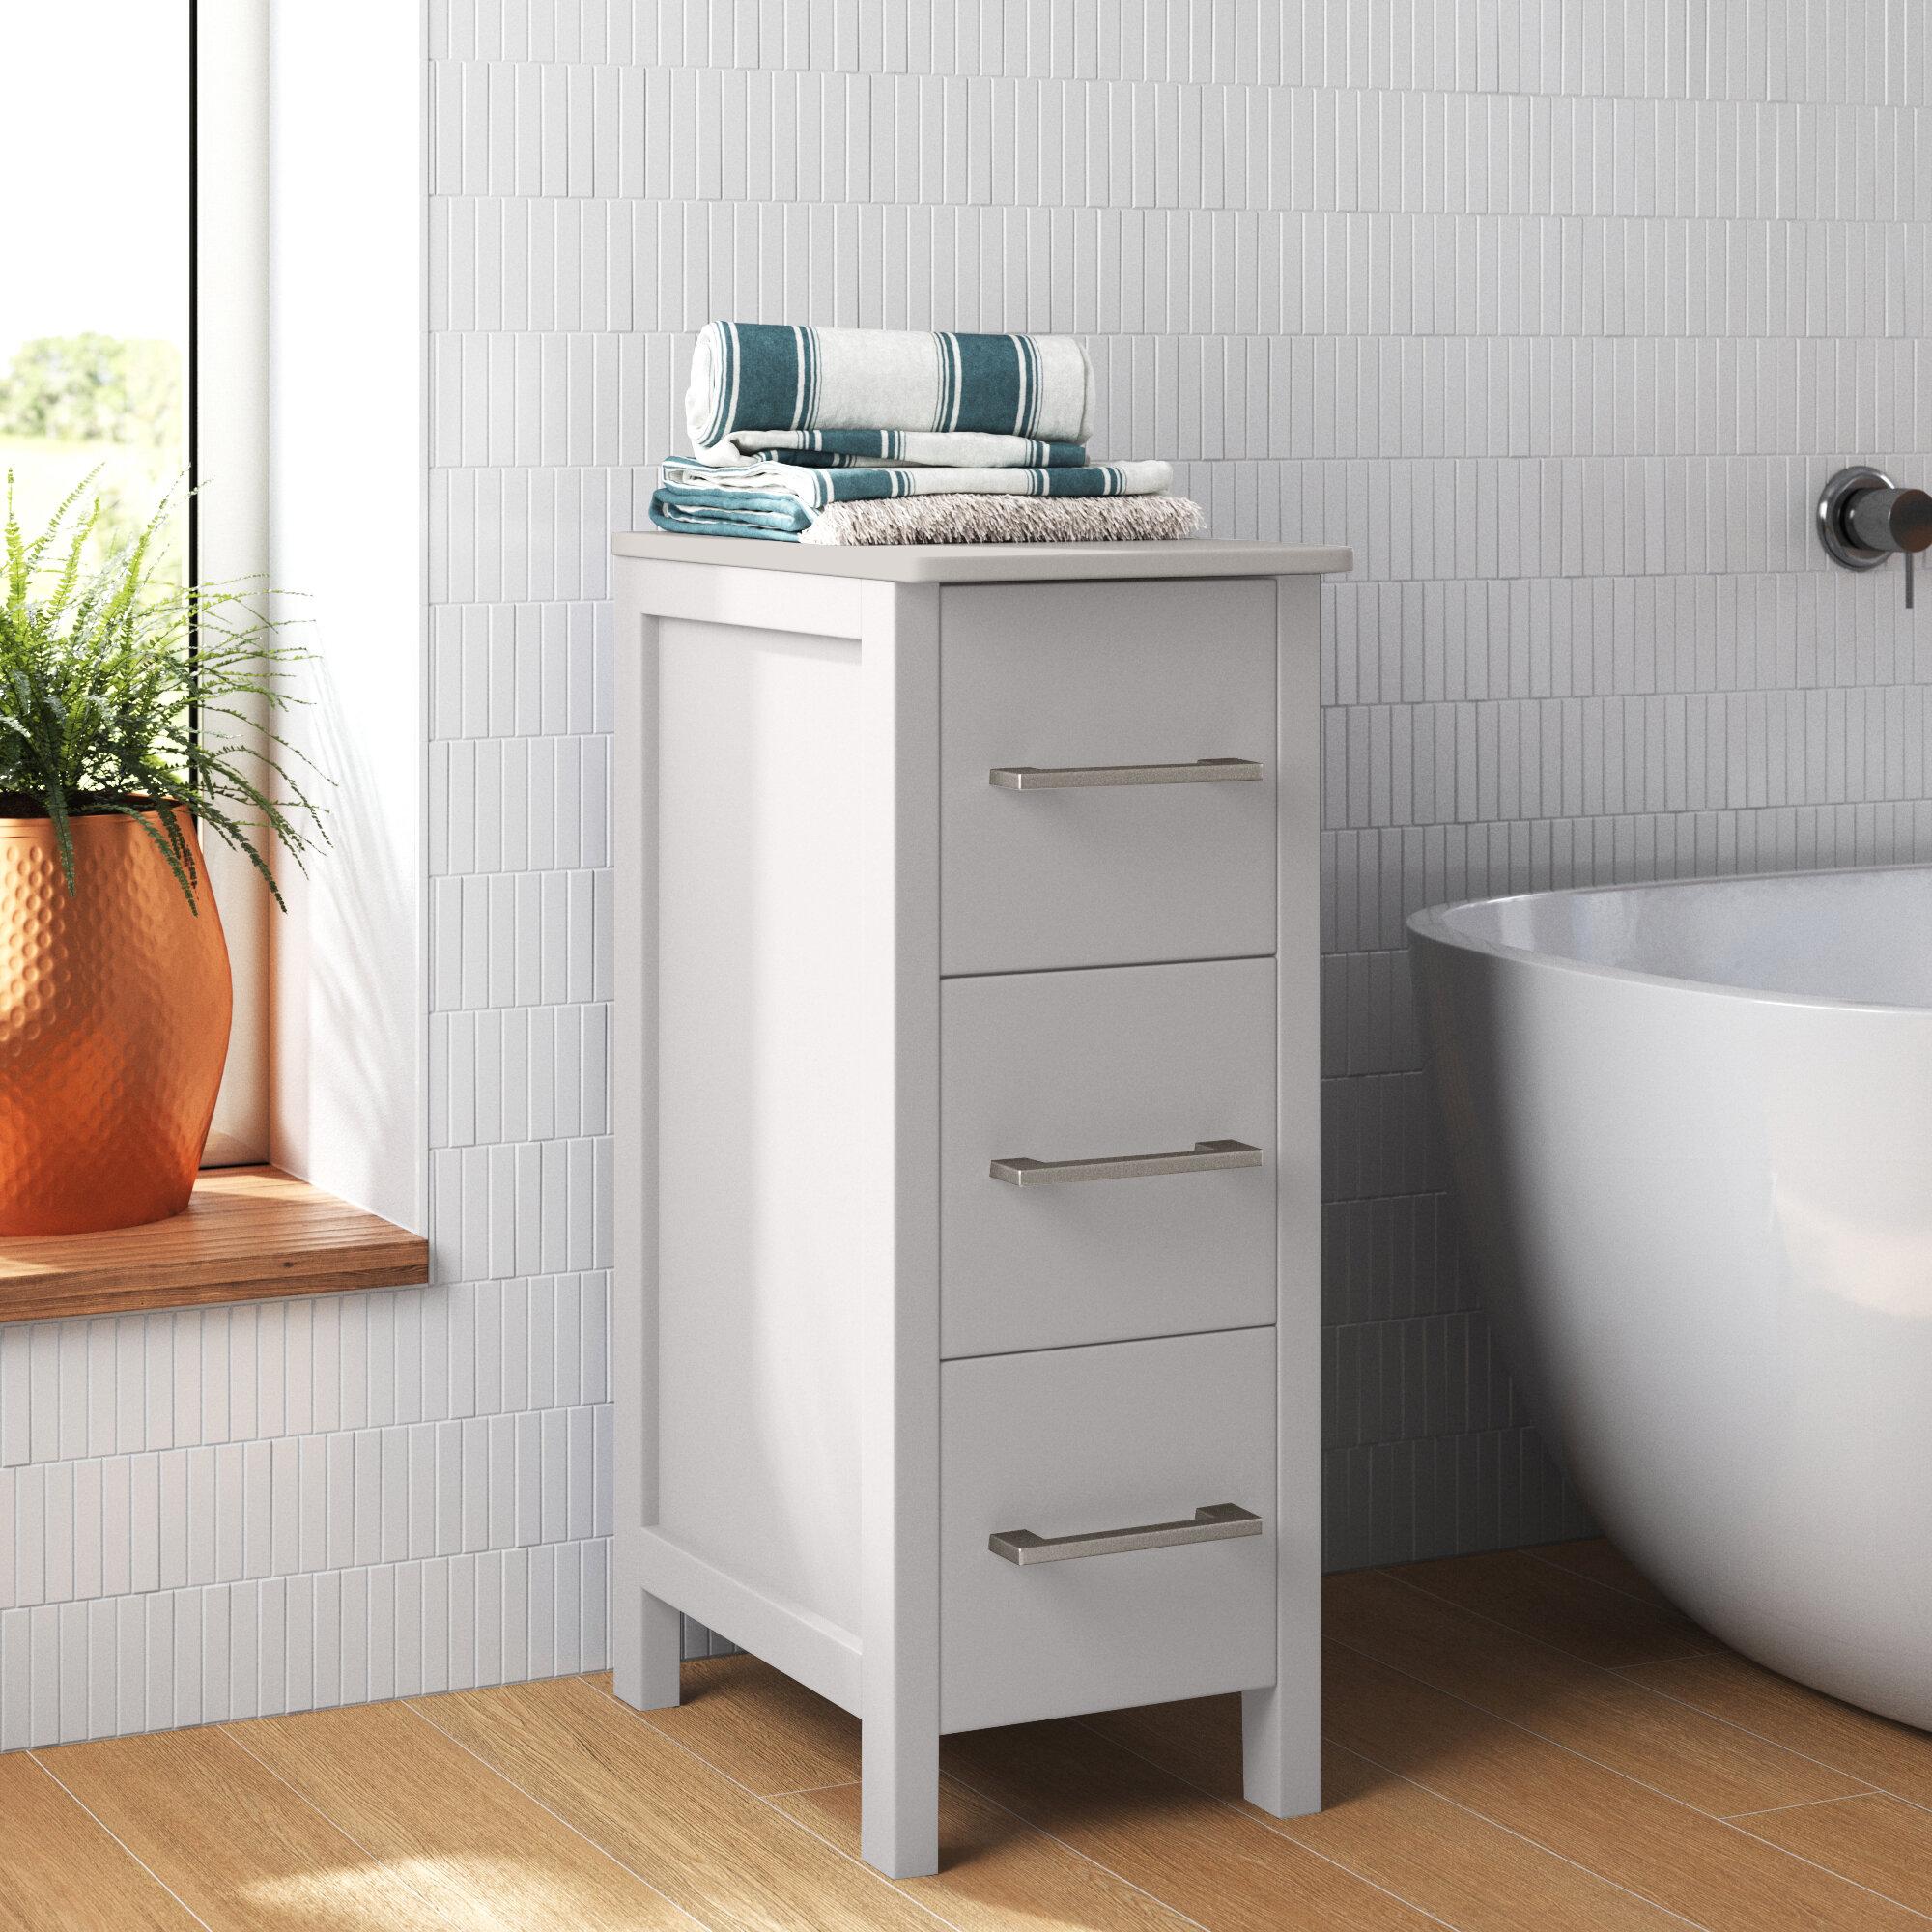 Solid Wood Bathroom Cabinets Shelving